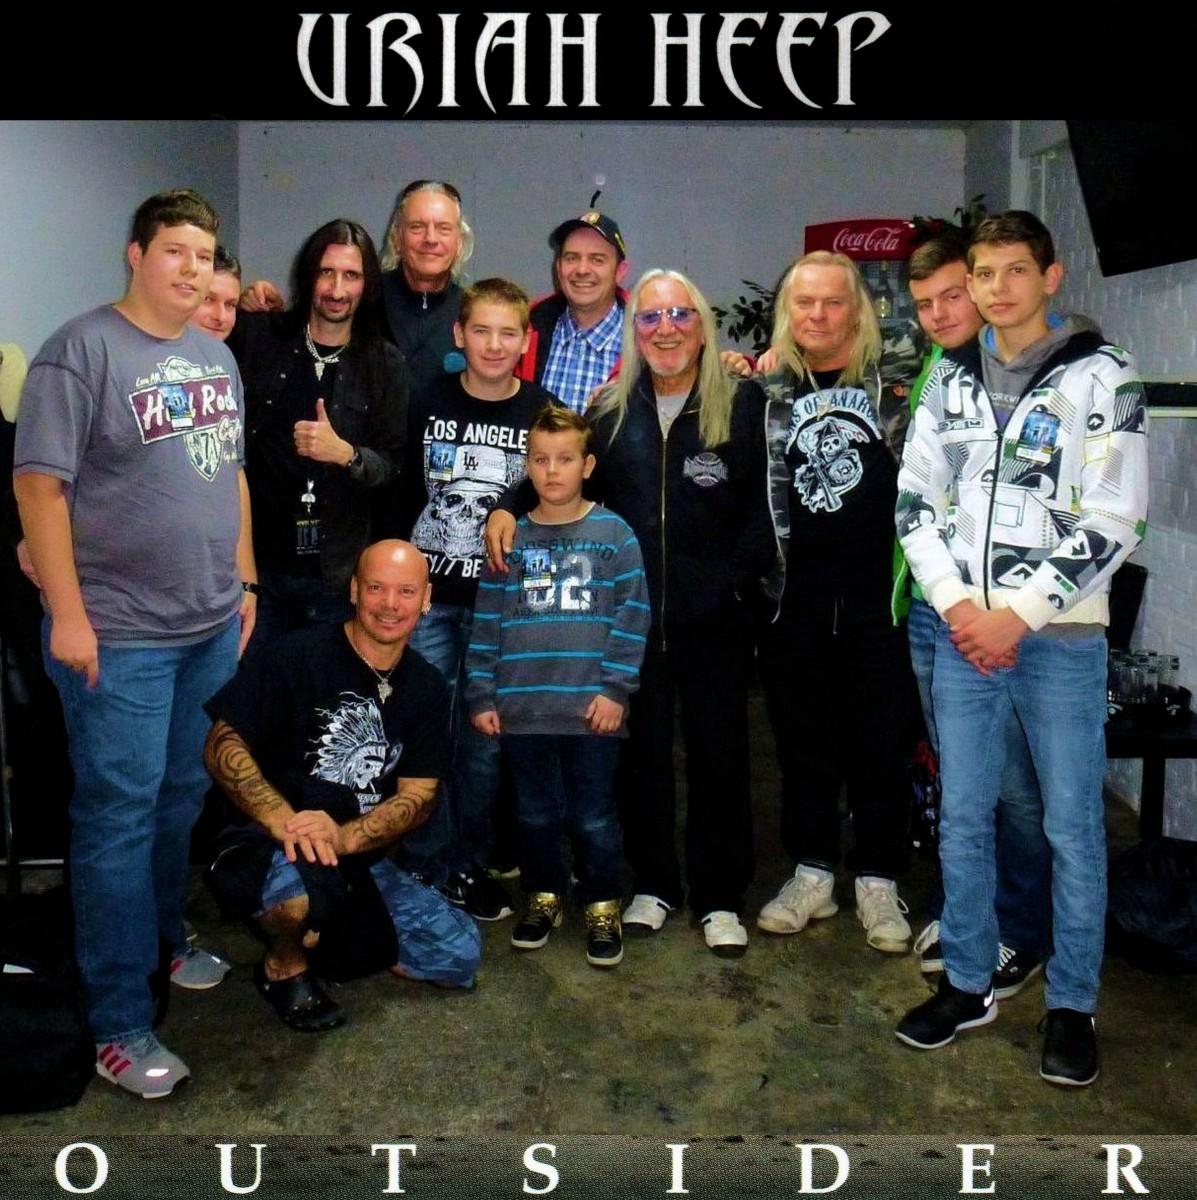 Uriah Heep Outsider